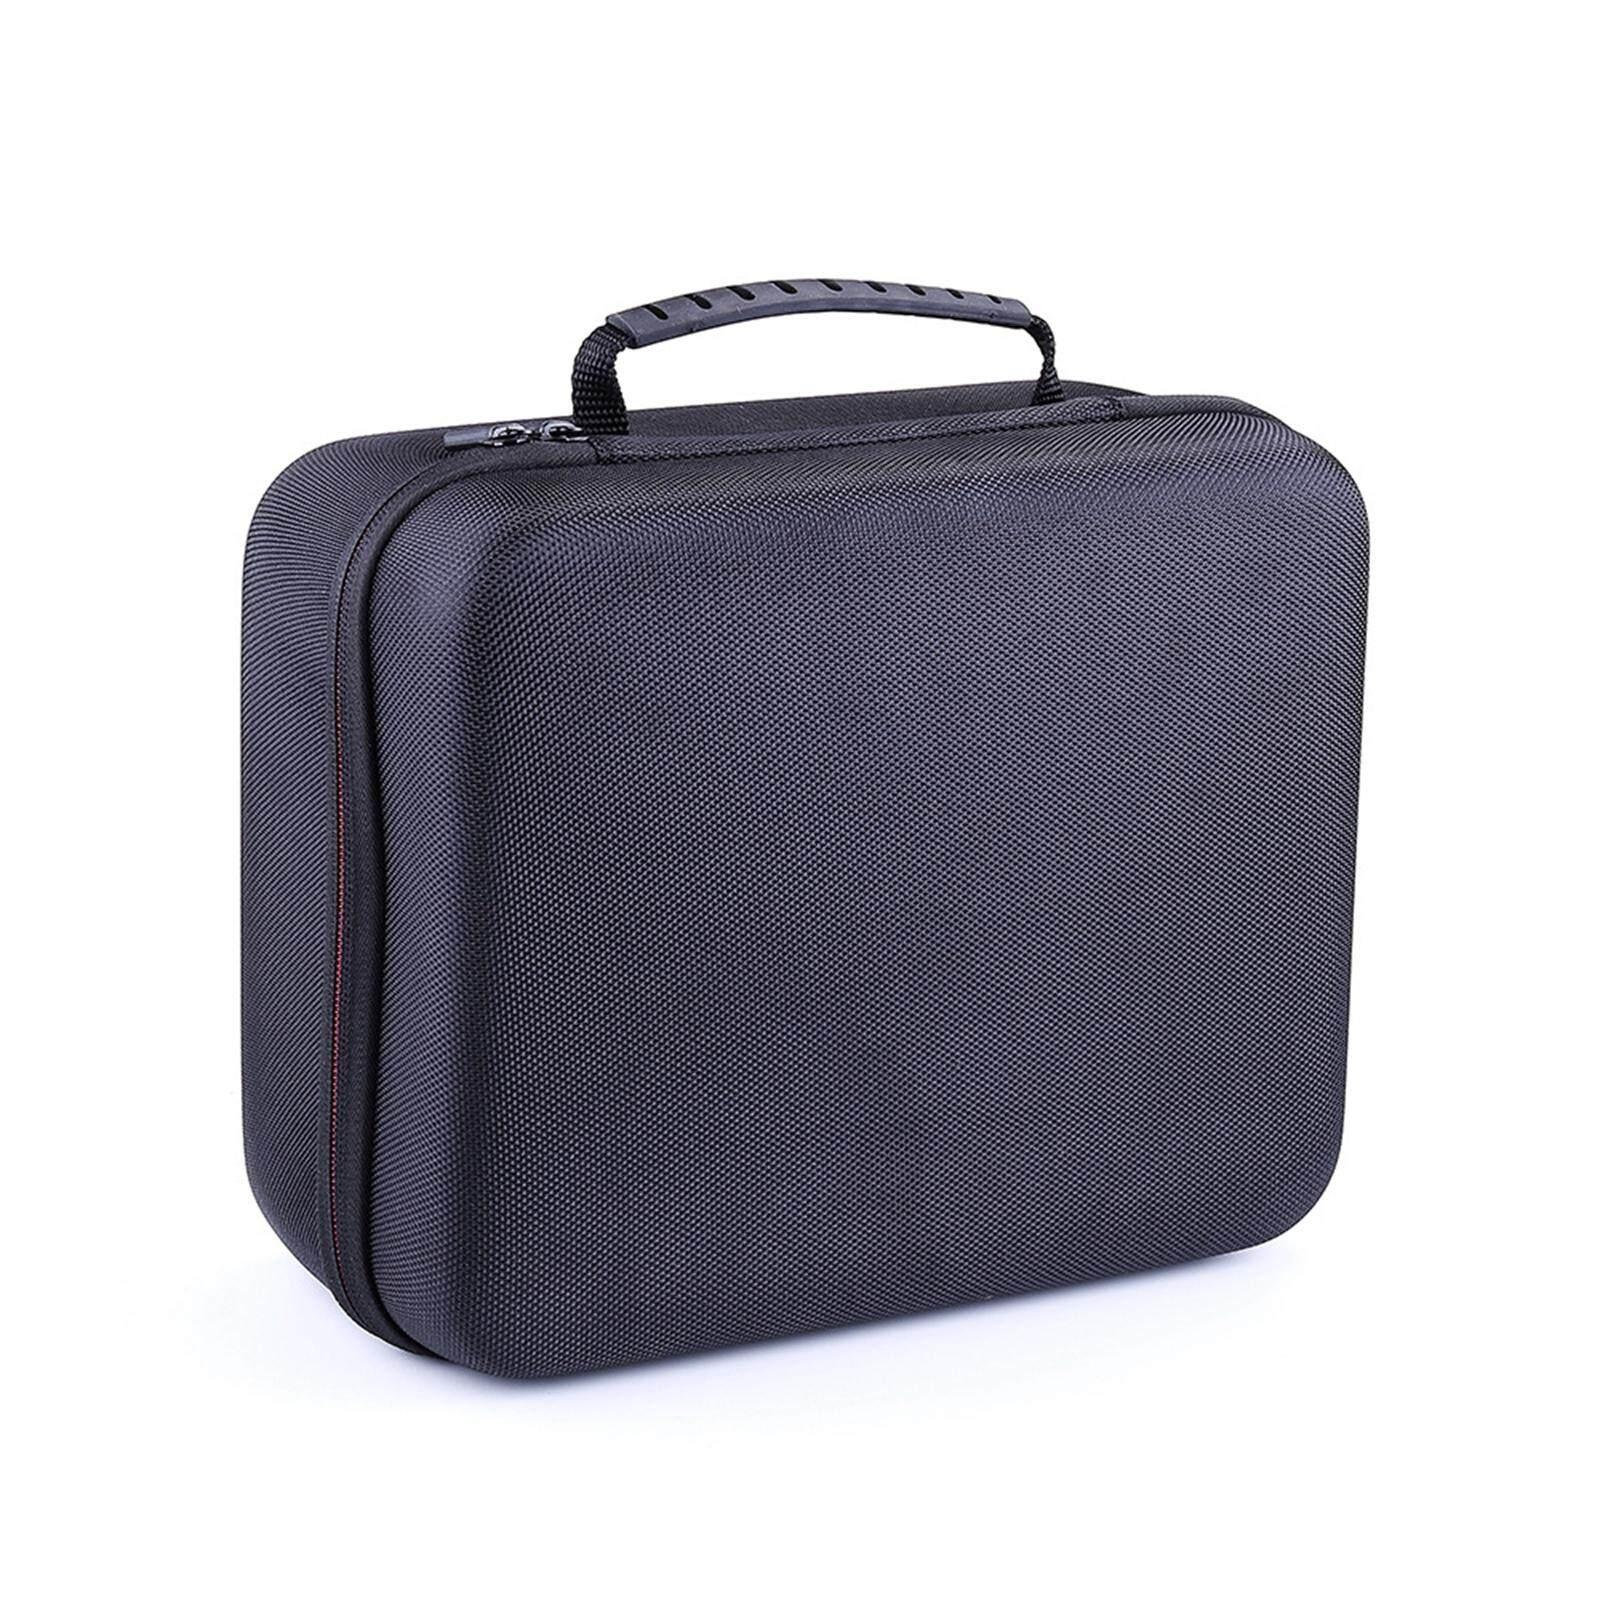 EVA Blue yeti Pro snow monster professional condenser microphone storage bag shockproof bag Carrying case